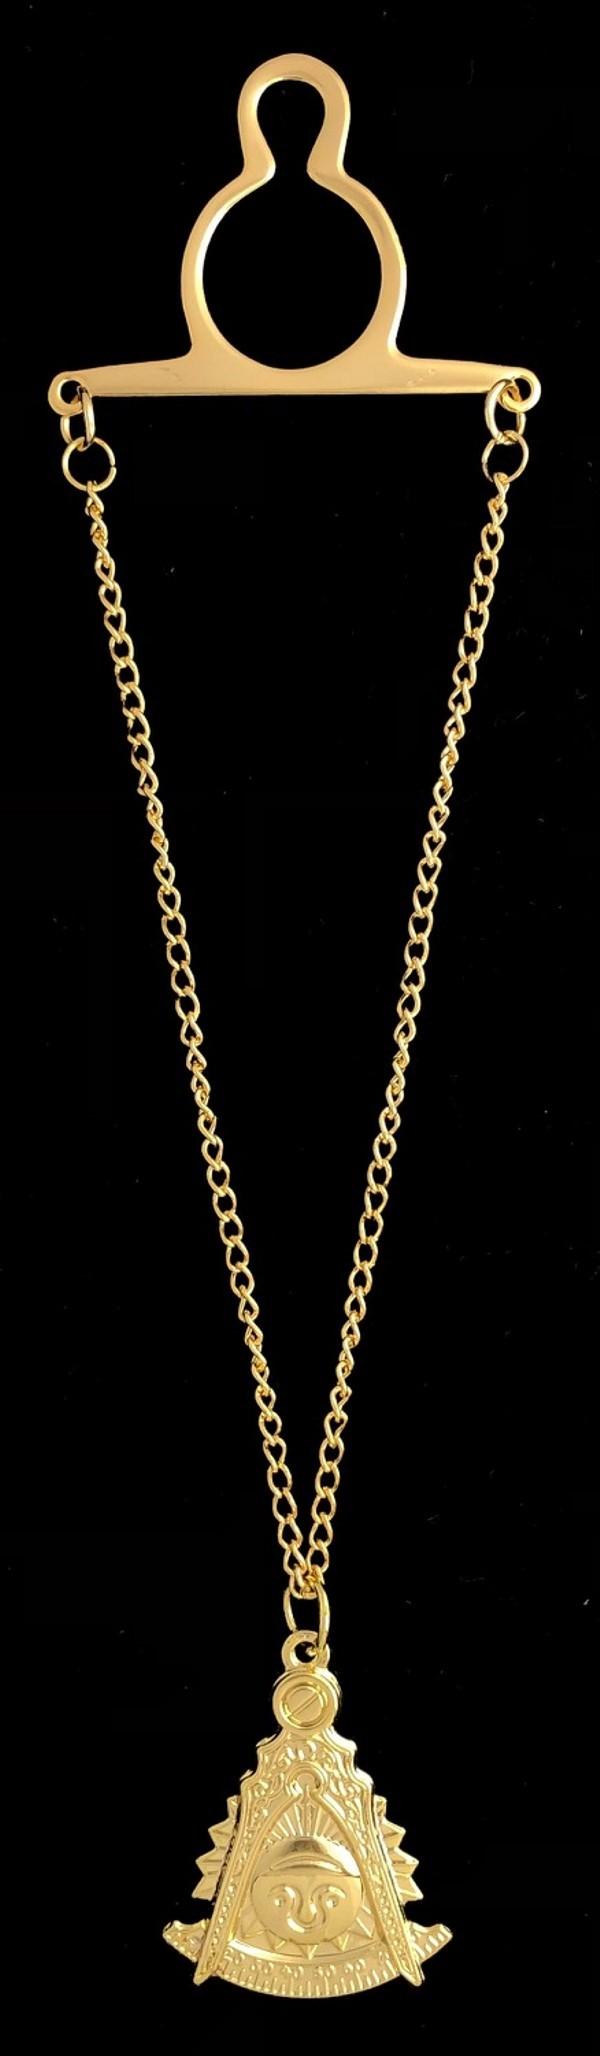 Masonic Past Master Emblem Tie Chain Gold New